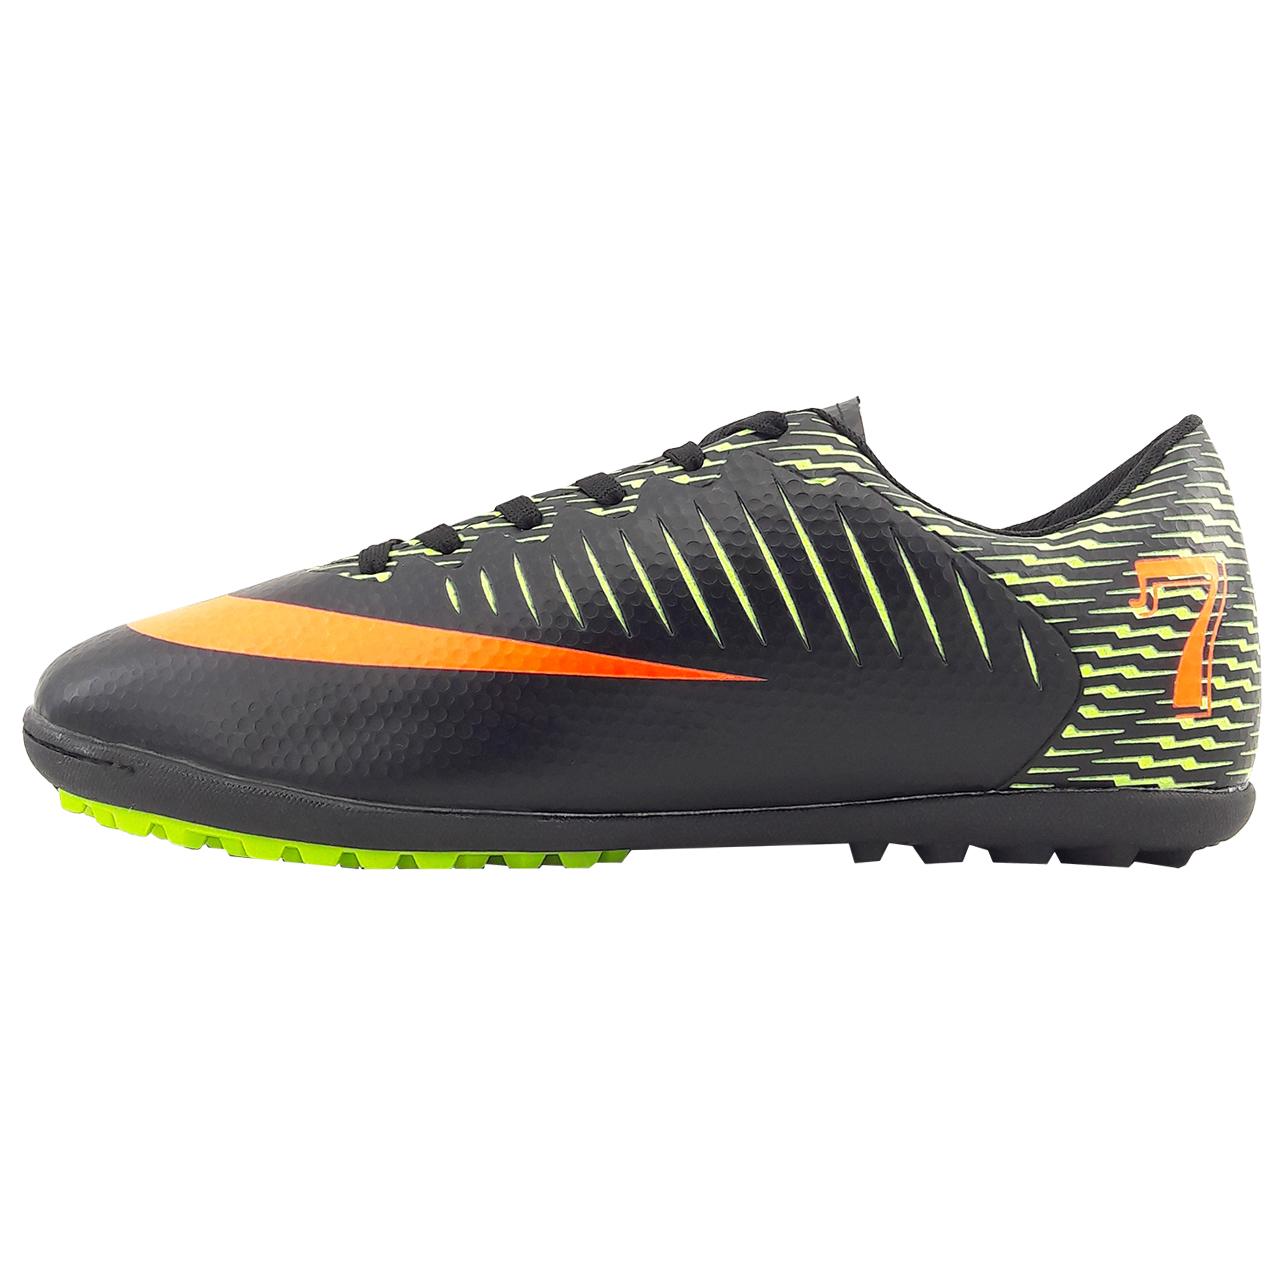 کفش فوتبال مردانه کینگ مدل Sky city 7.bl001